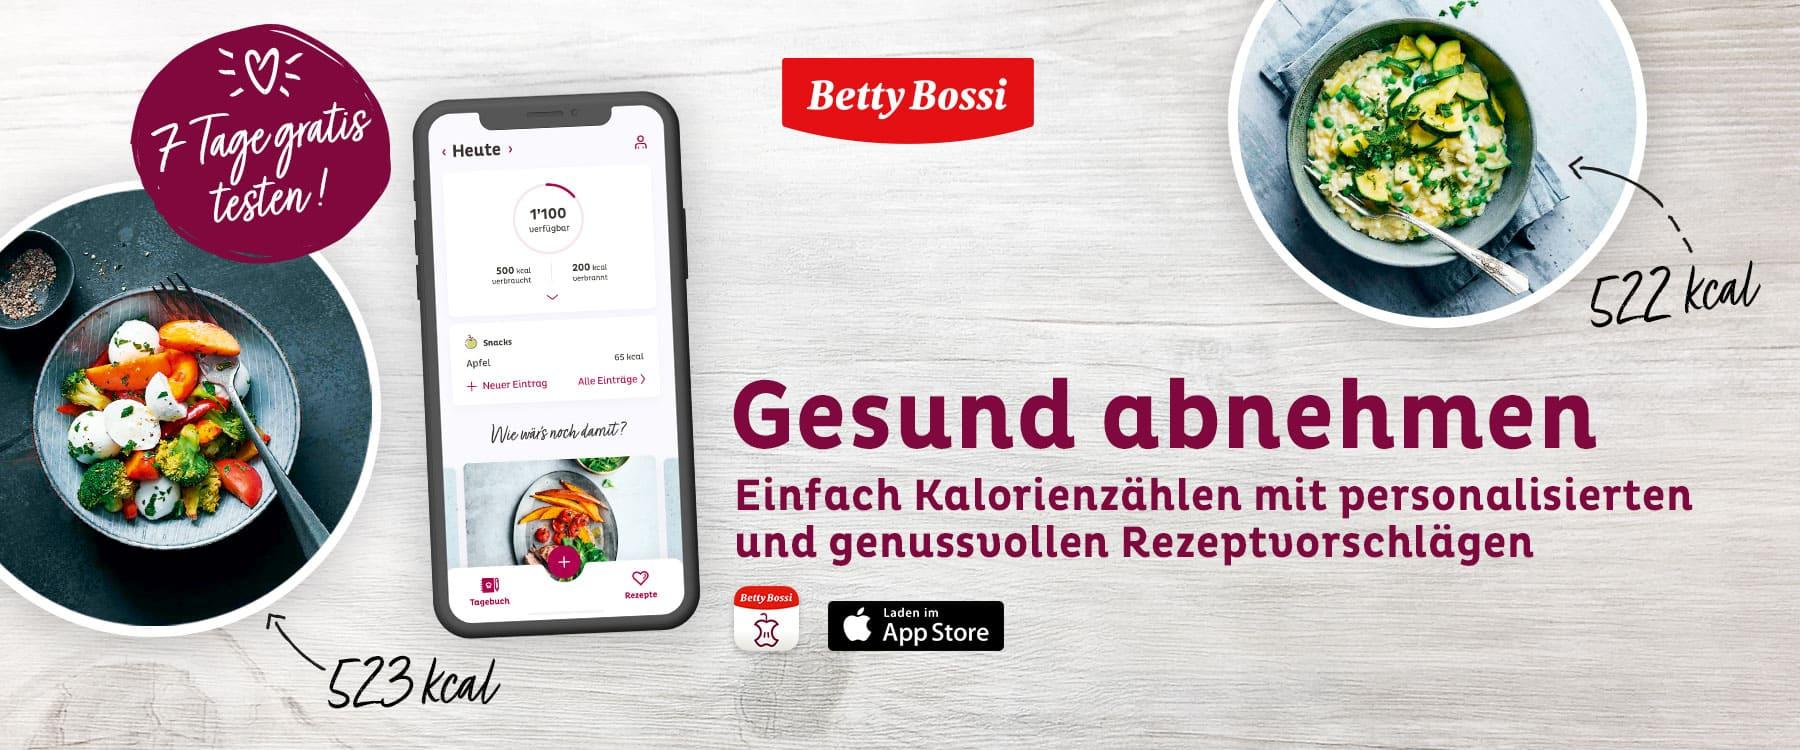 Betty Bossi Banner